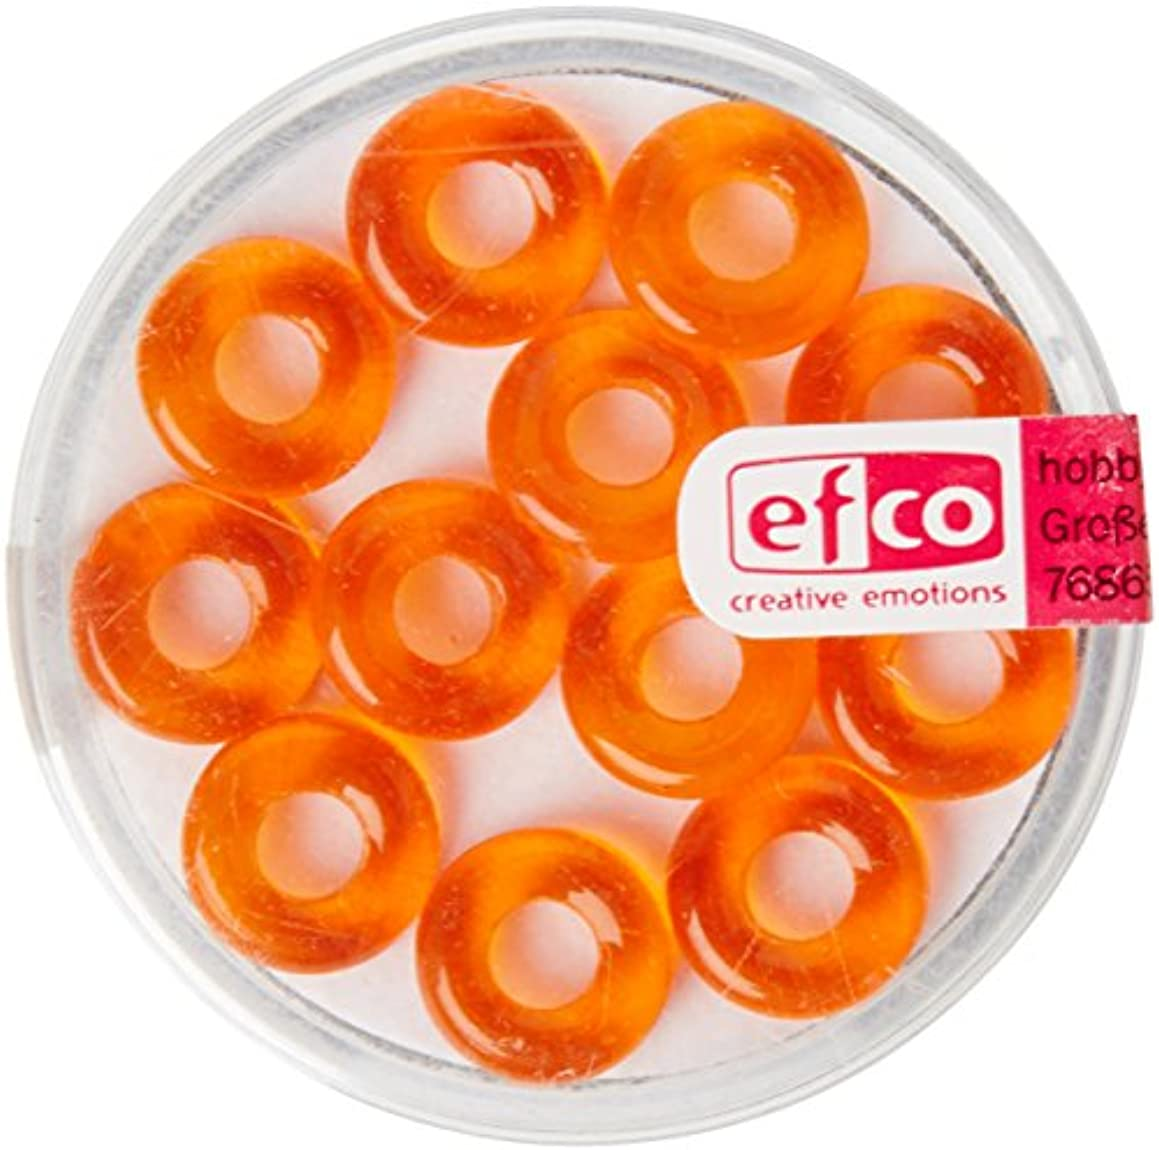 Efco Glass Bead Ring Big Hole 3 x 10 mm / 4 mm 12 pcs. Orange, Silver, 3 x 3 x 2 cm